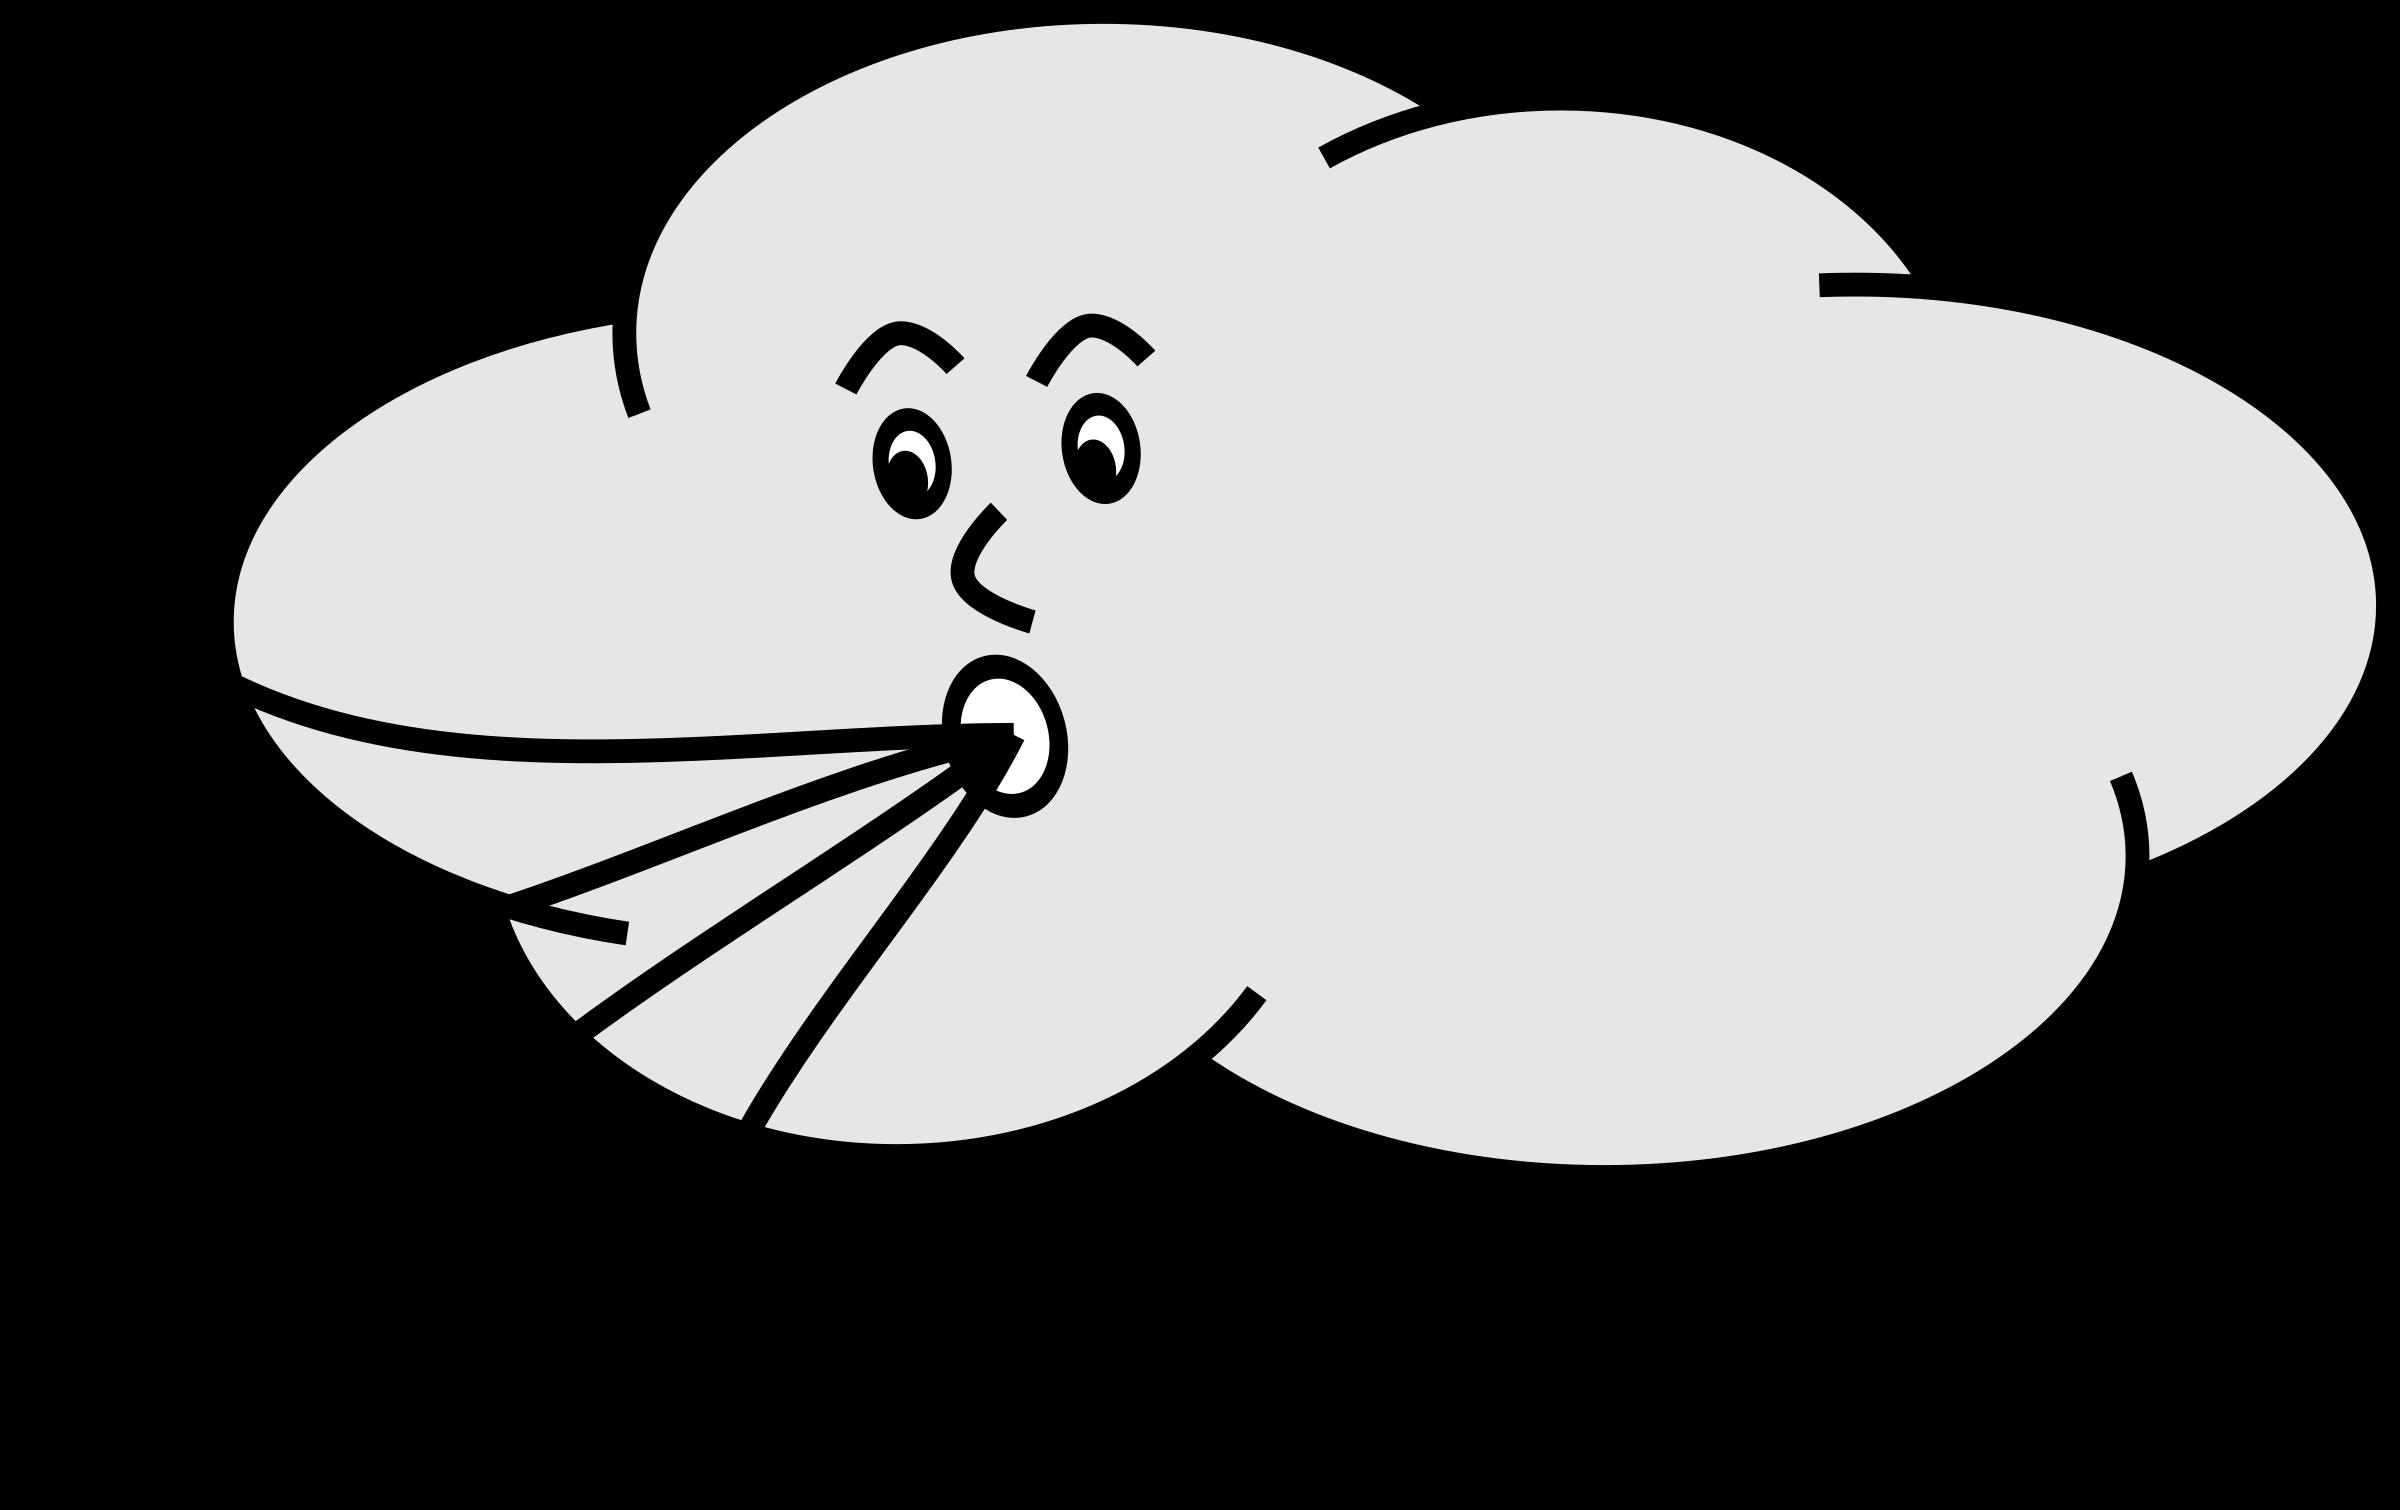 Clipart Wind Blowing Cloud Wind Cartoon Blowing Wind Free Clip Art